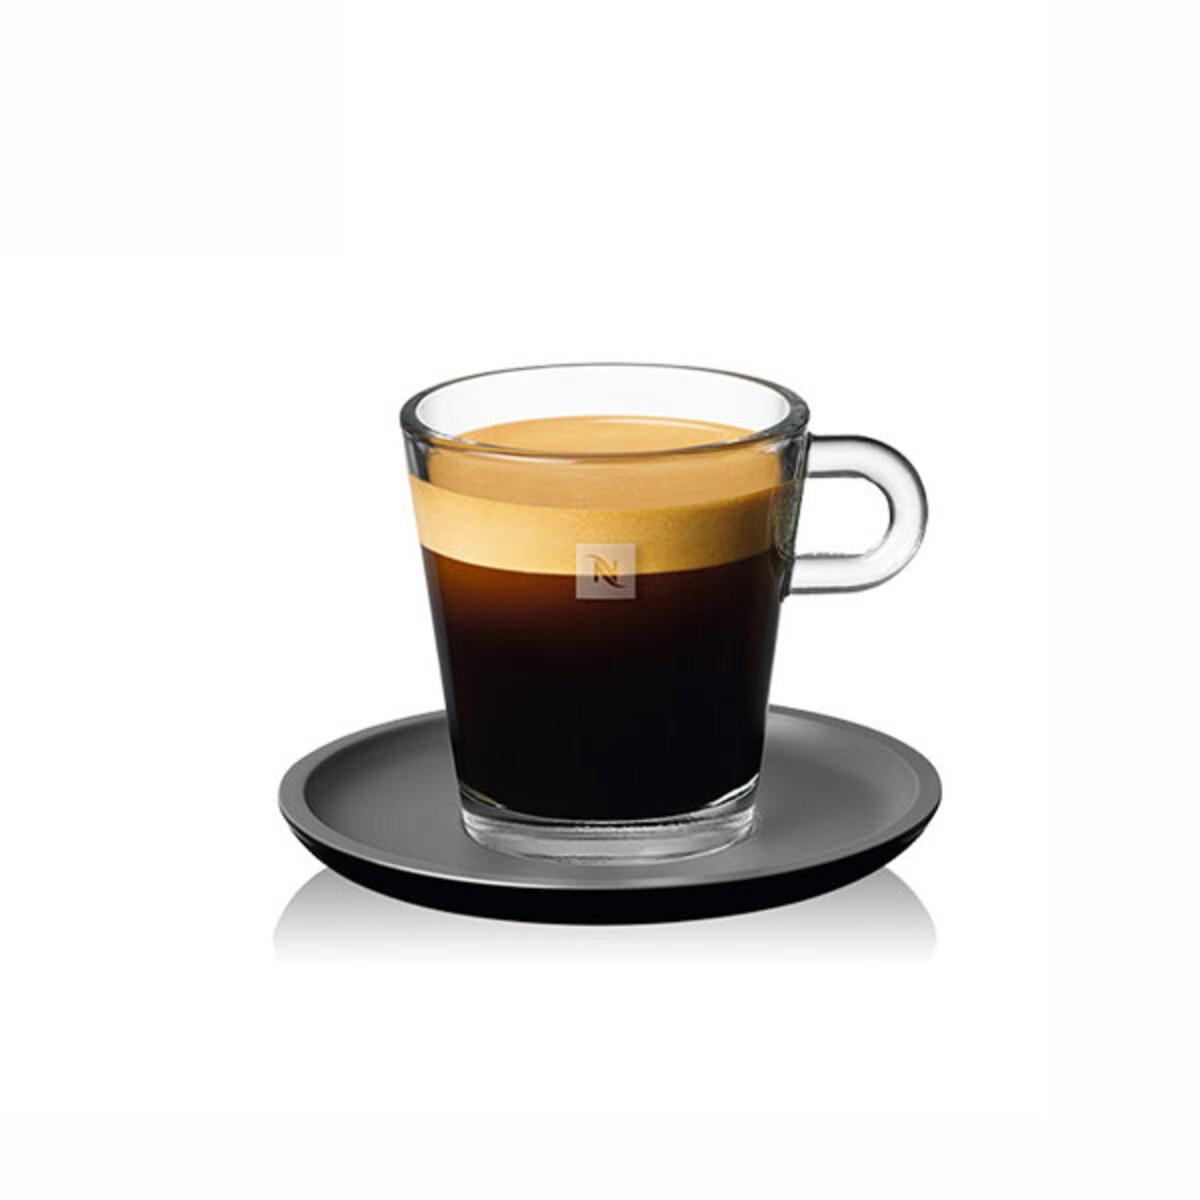 Nespresso Glass Lungo